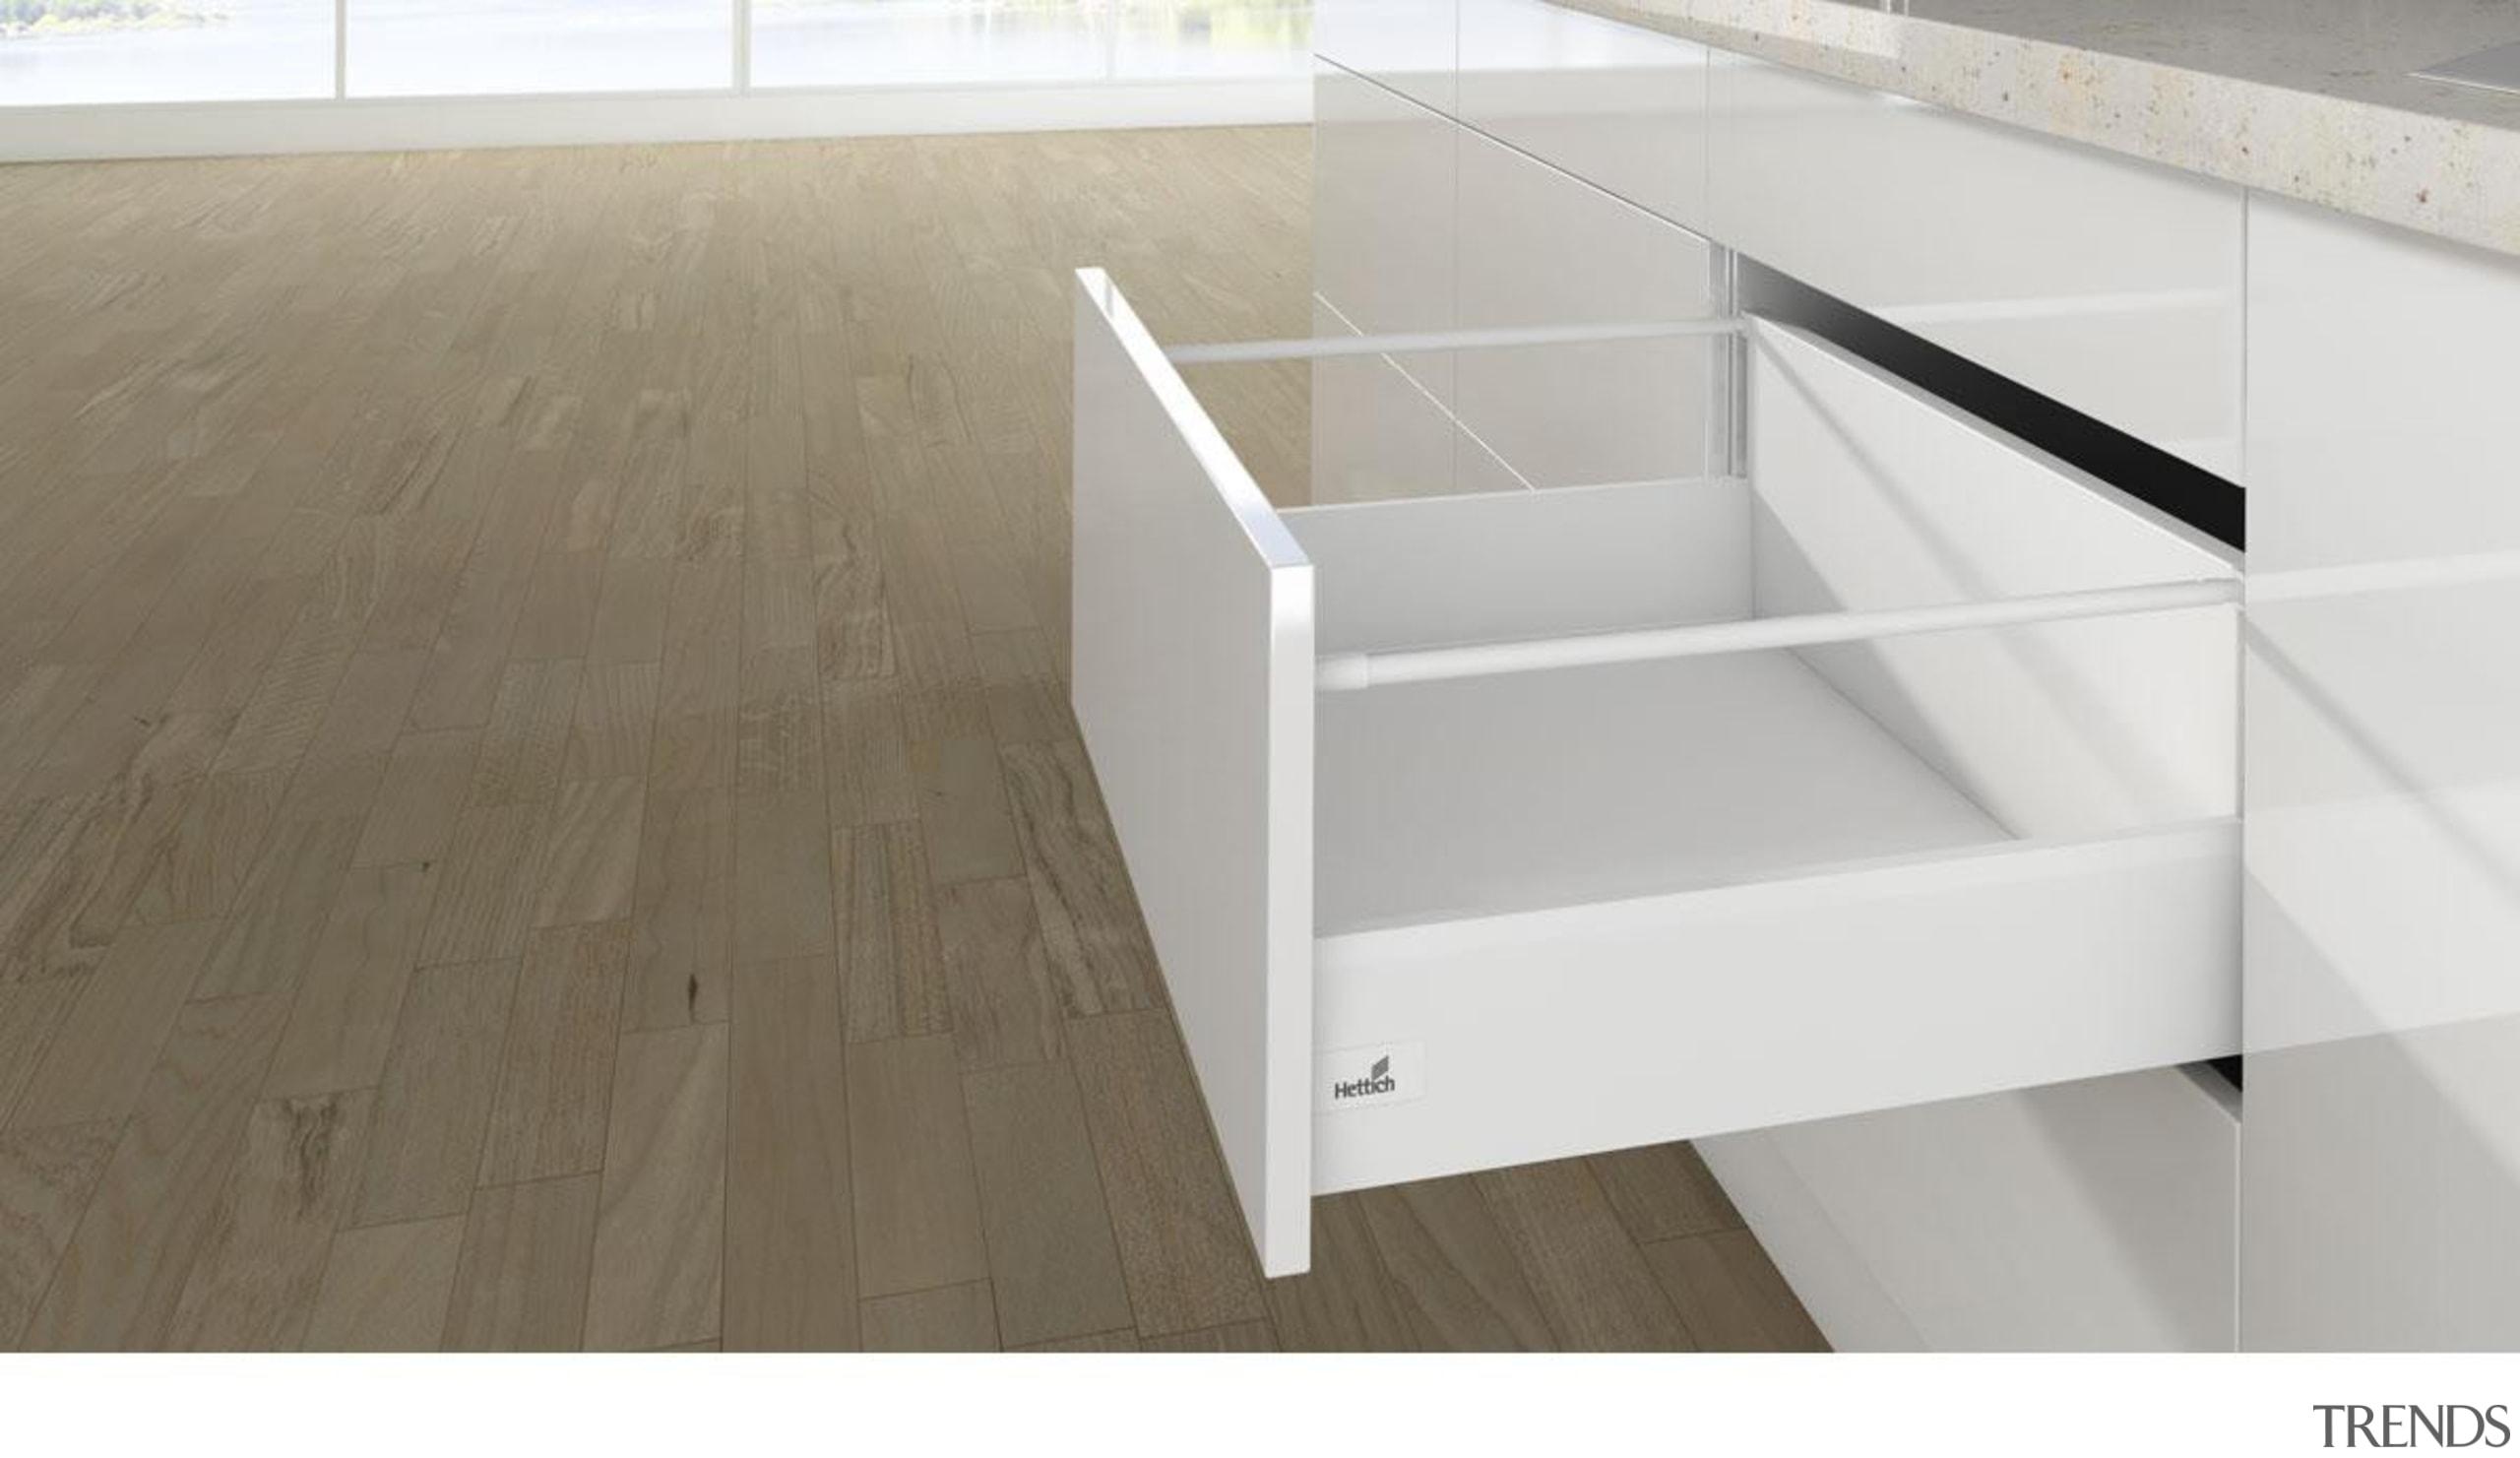 Lengthwise Railing - Round - Lengthwise Railing - drawer, floor, furniture, plywood, product, product design, table, white